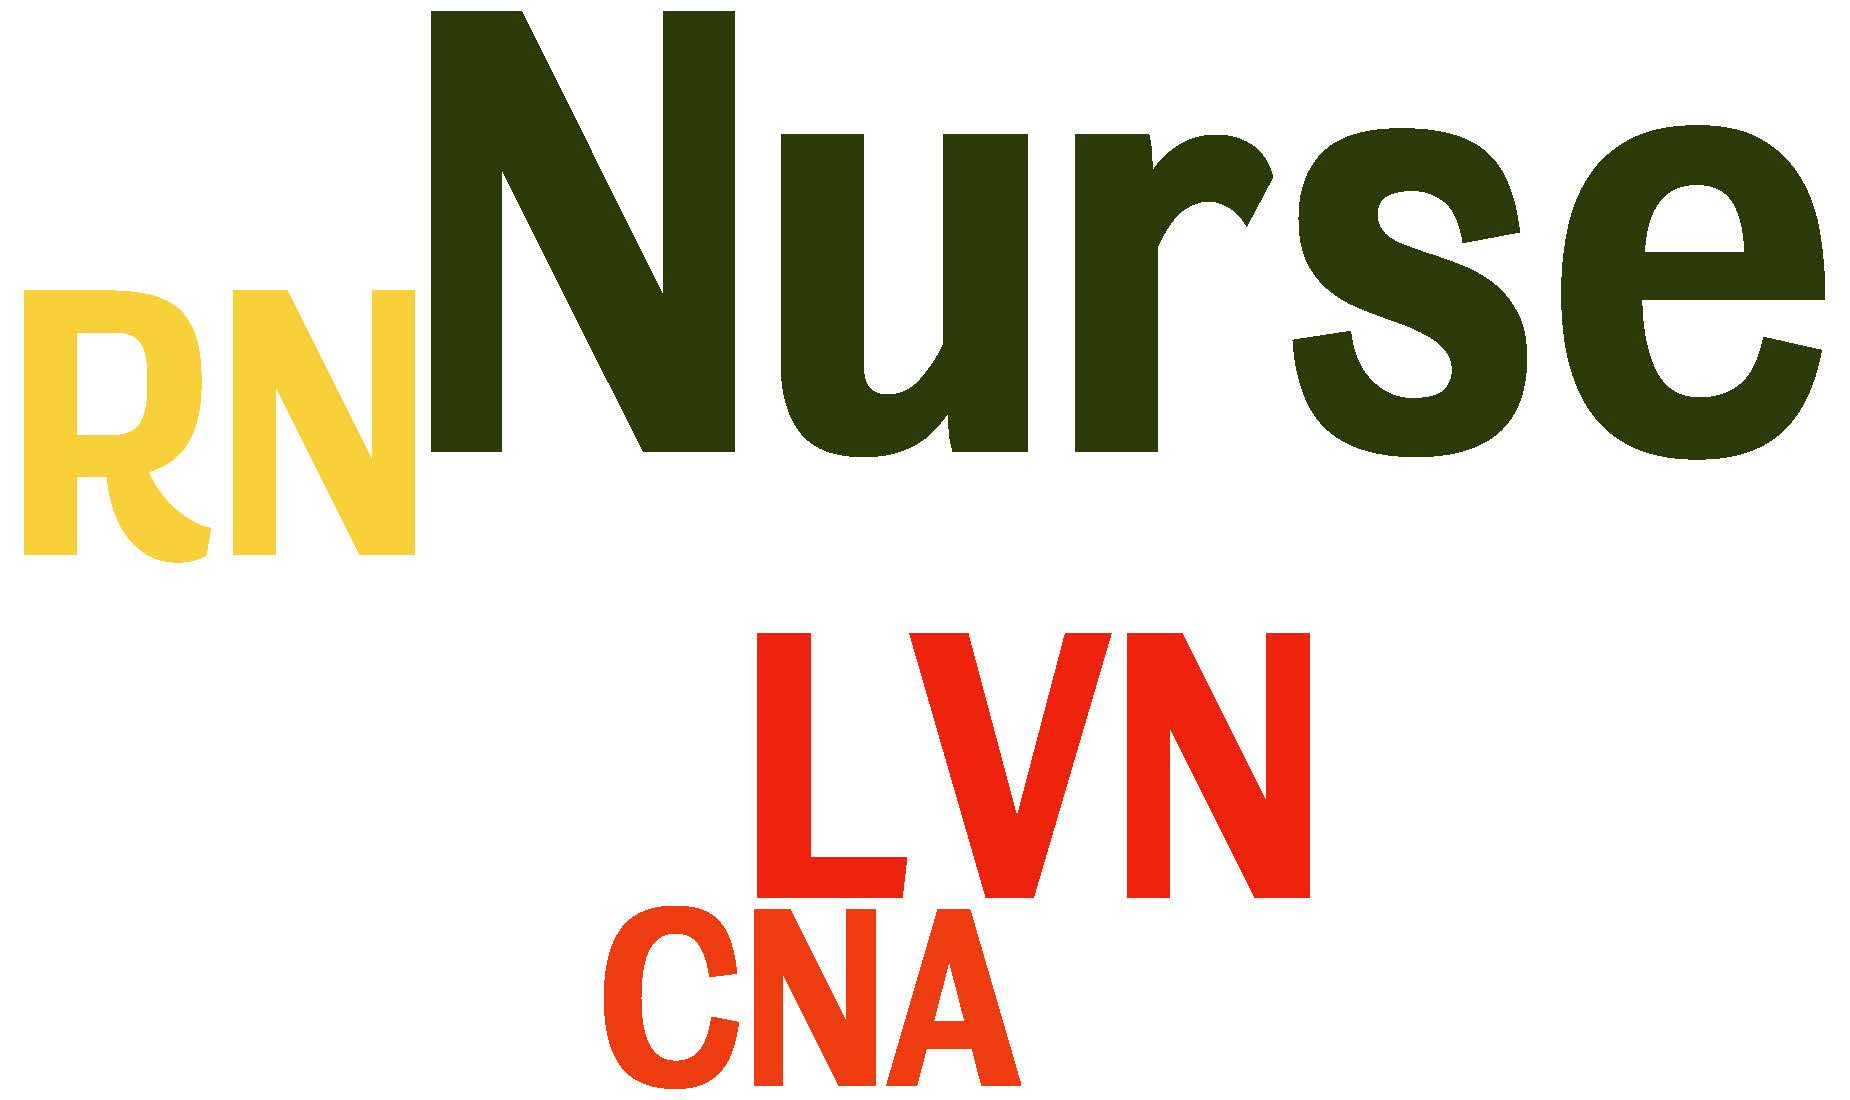 Nurse Rn Lvn Cna